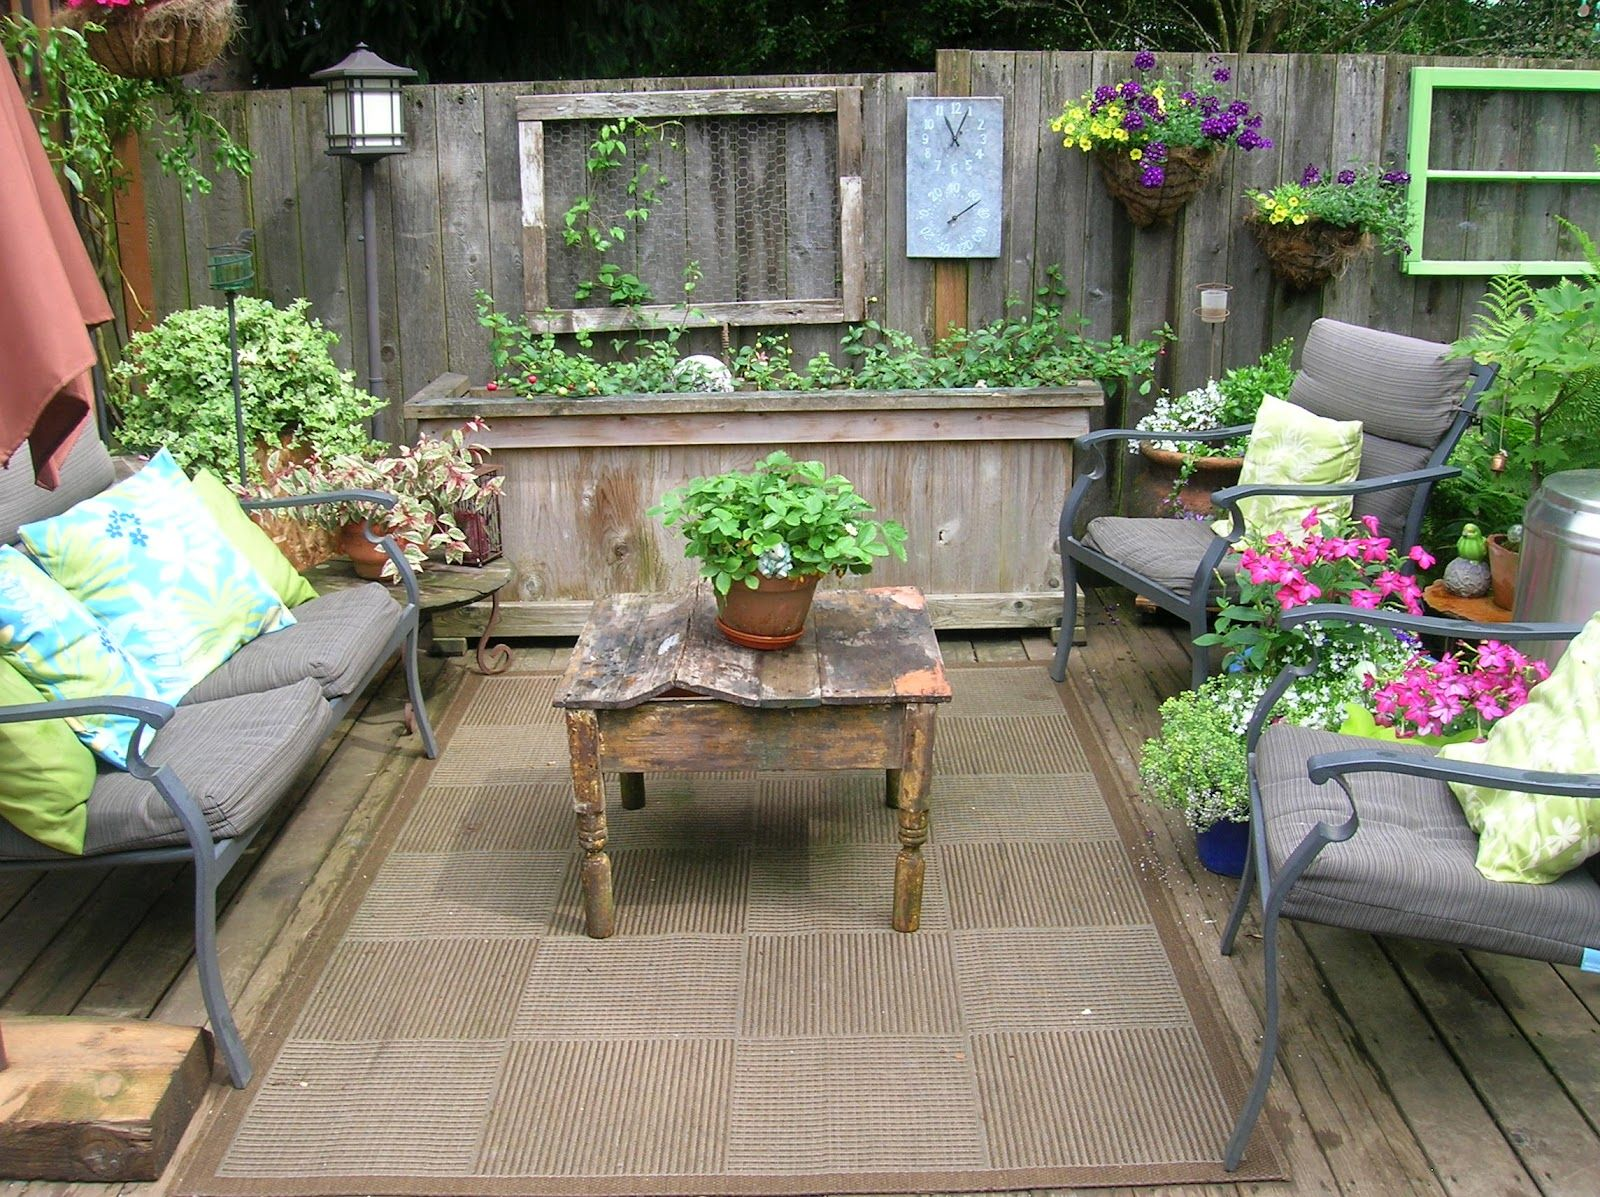 Pin By Emma Helminski On For The Home Yard Art Landscape Design Garden Room